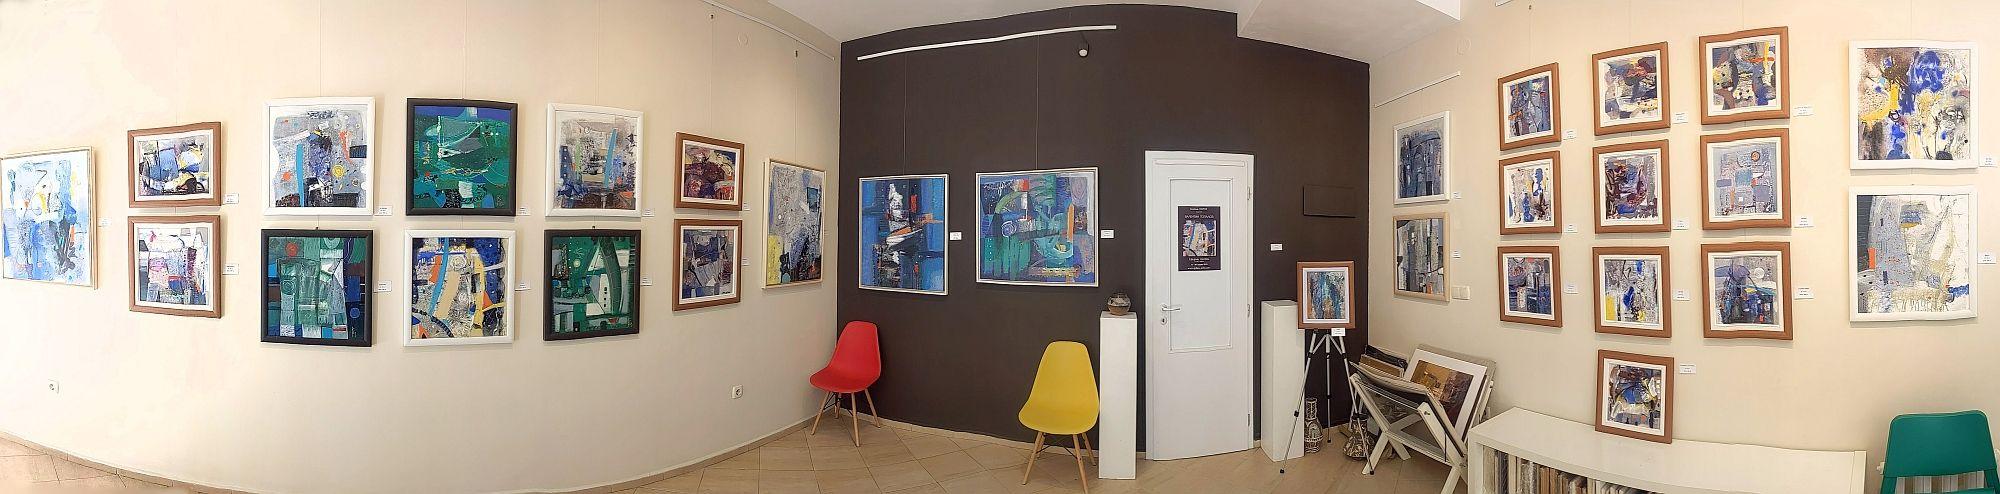 Valentin Topalov- izlozhba panorama